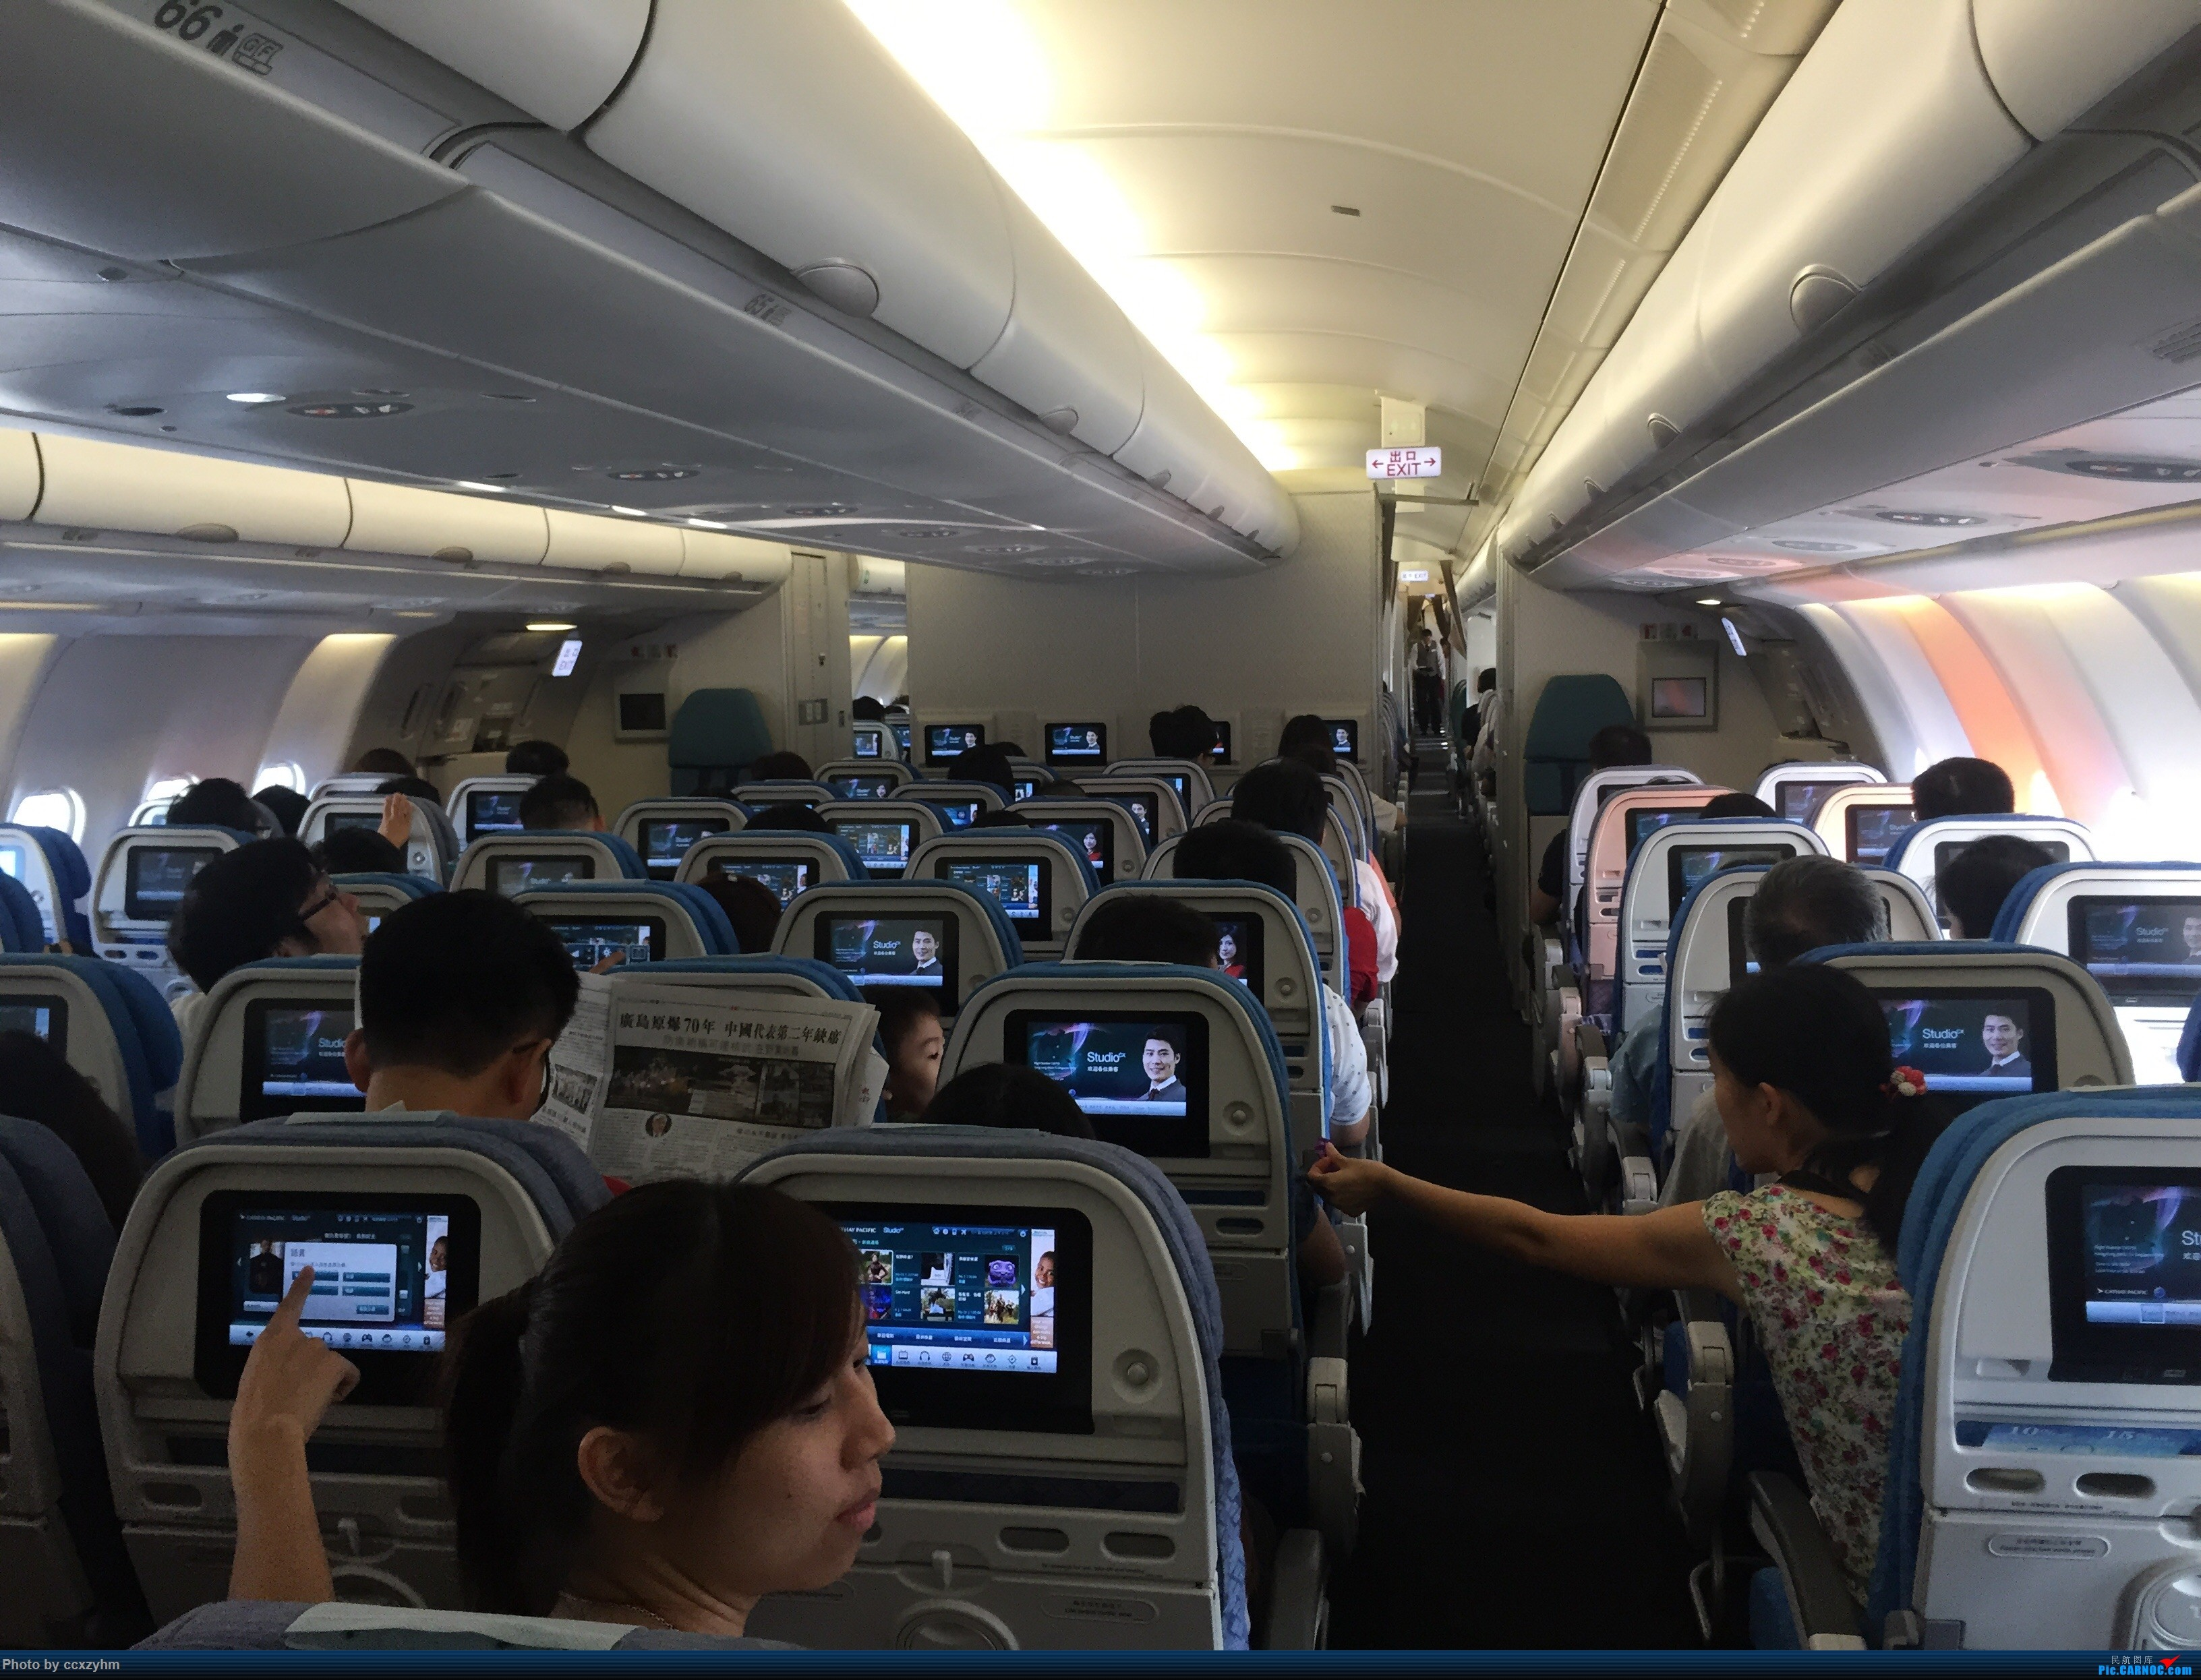 Re:[原创]PEK-HKG-SIN 港龙+国泰 KA+CX 暑假游坡县 333  HKG